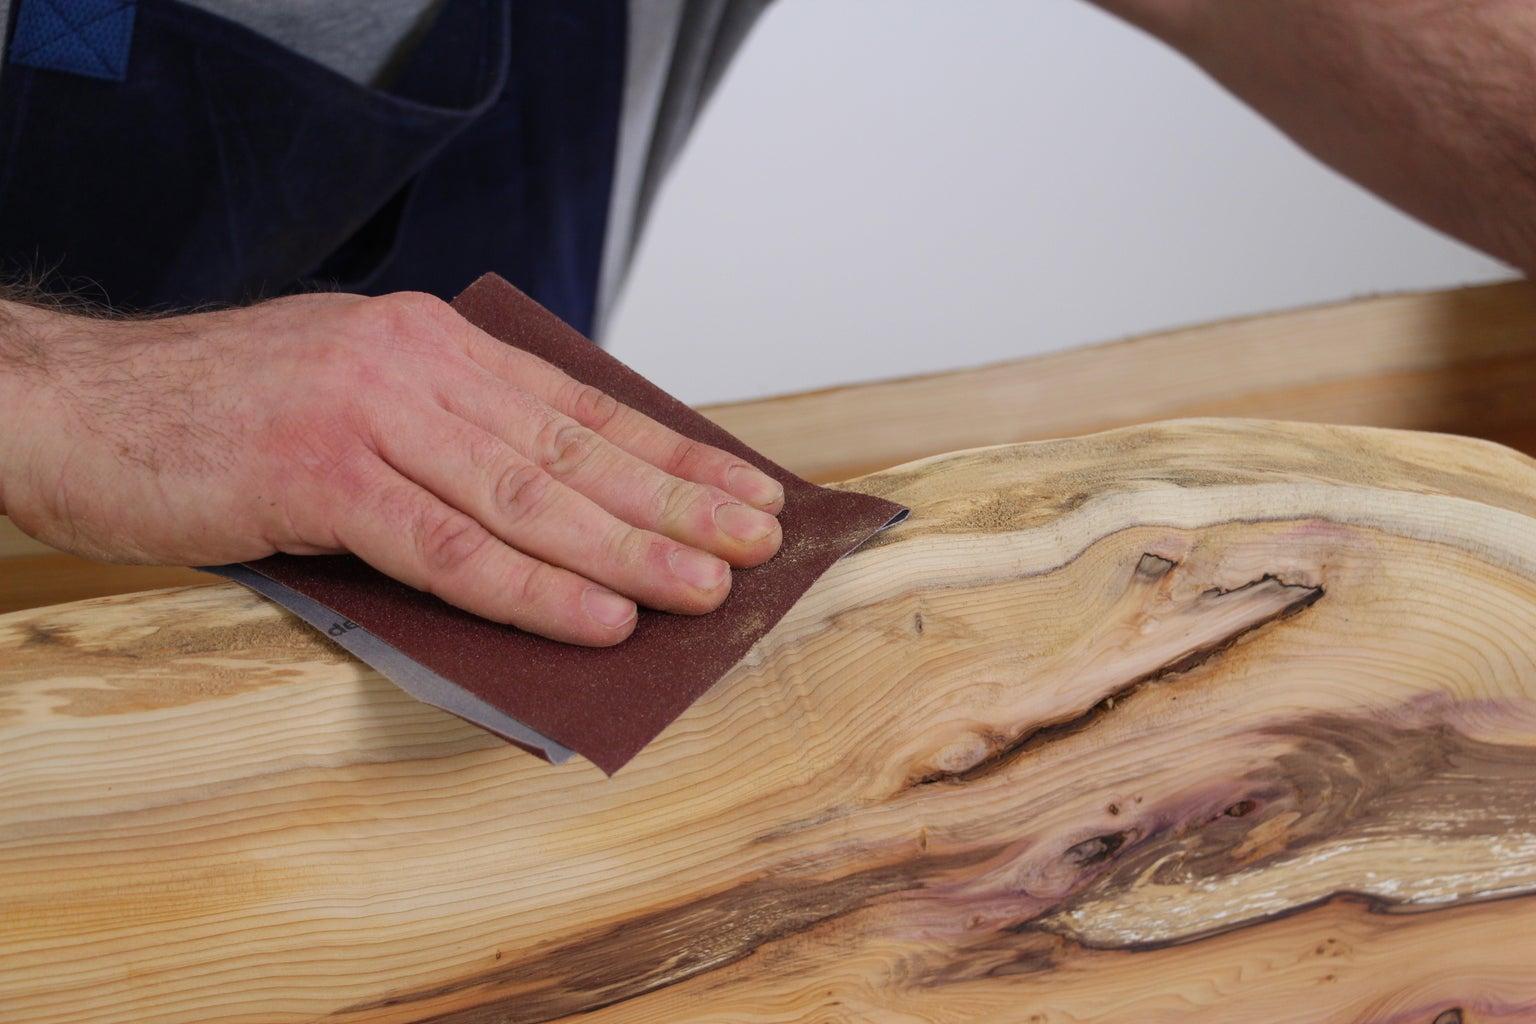 Choosing and Preparing the Wood